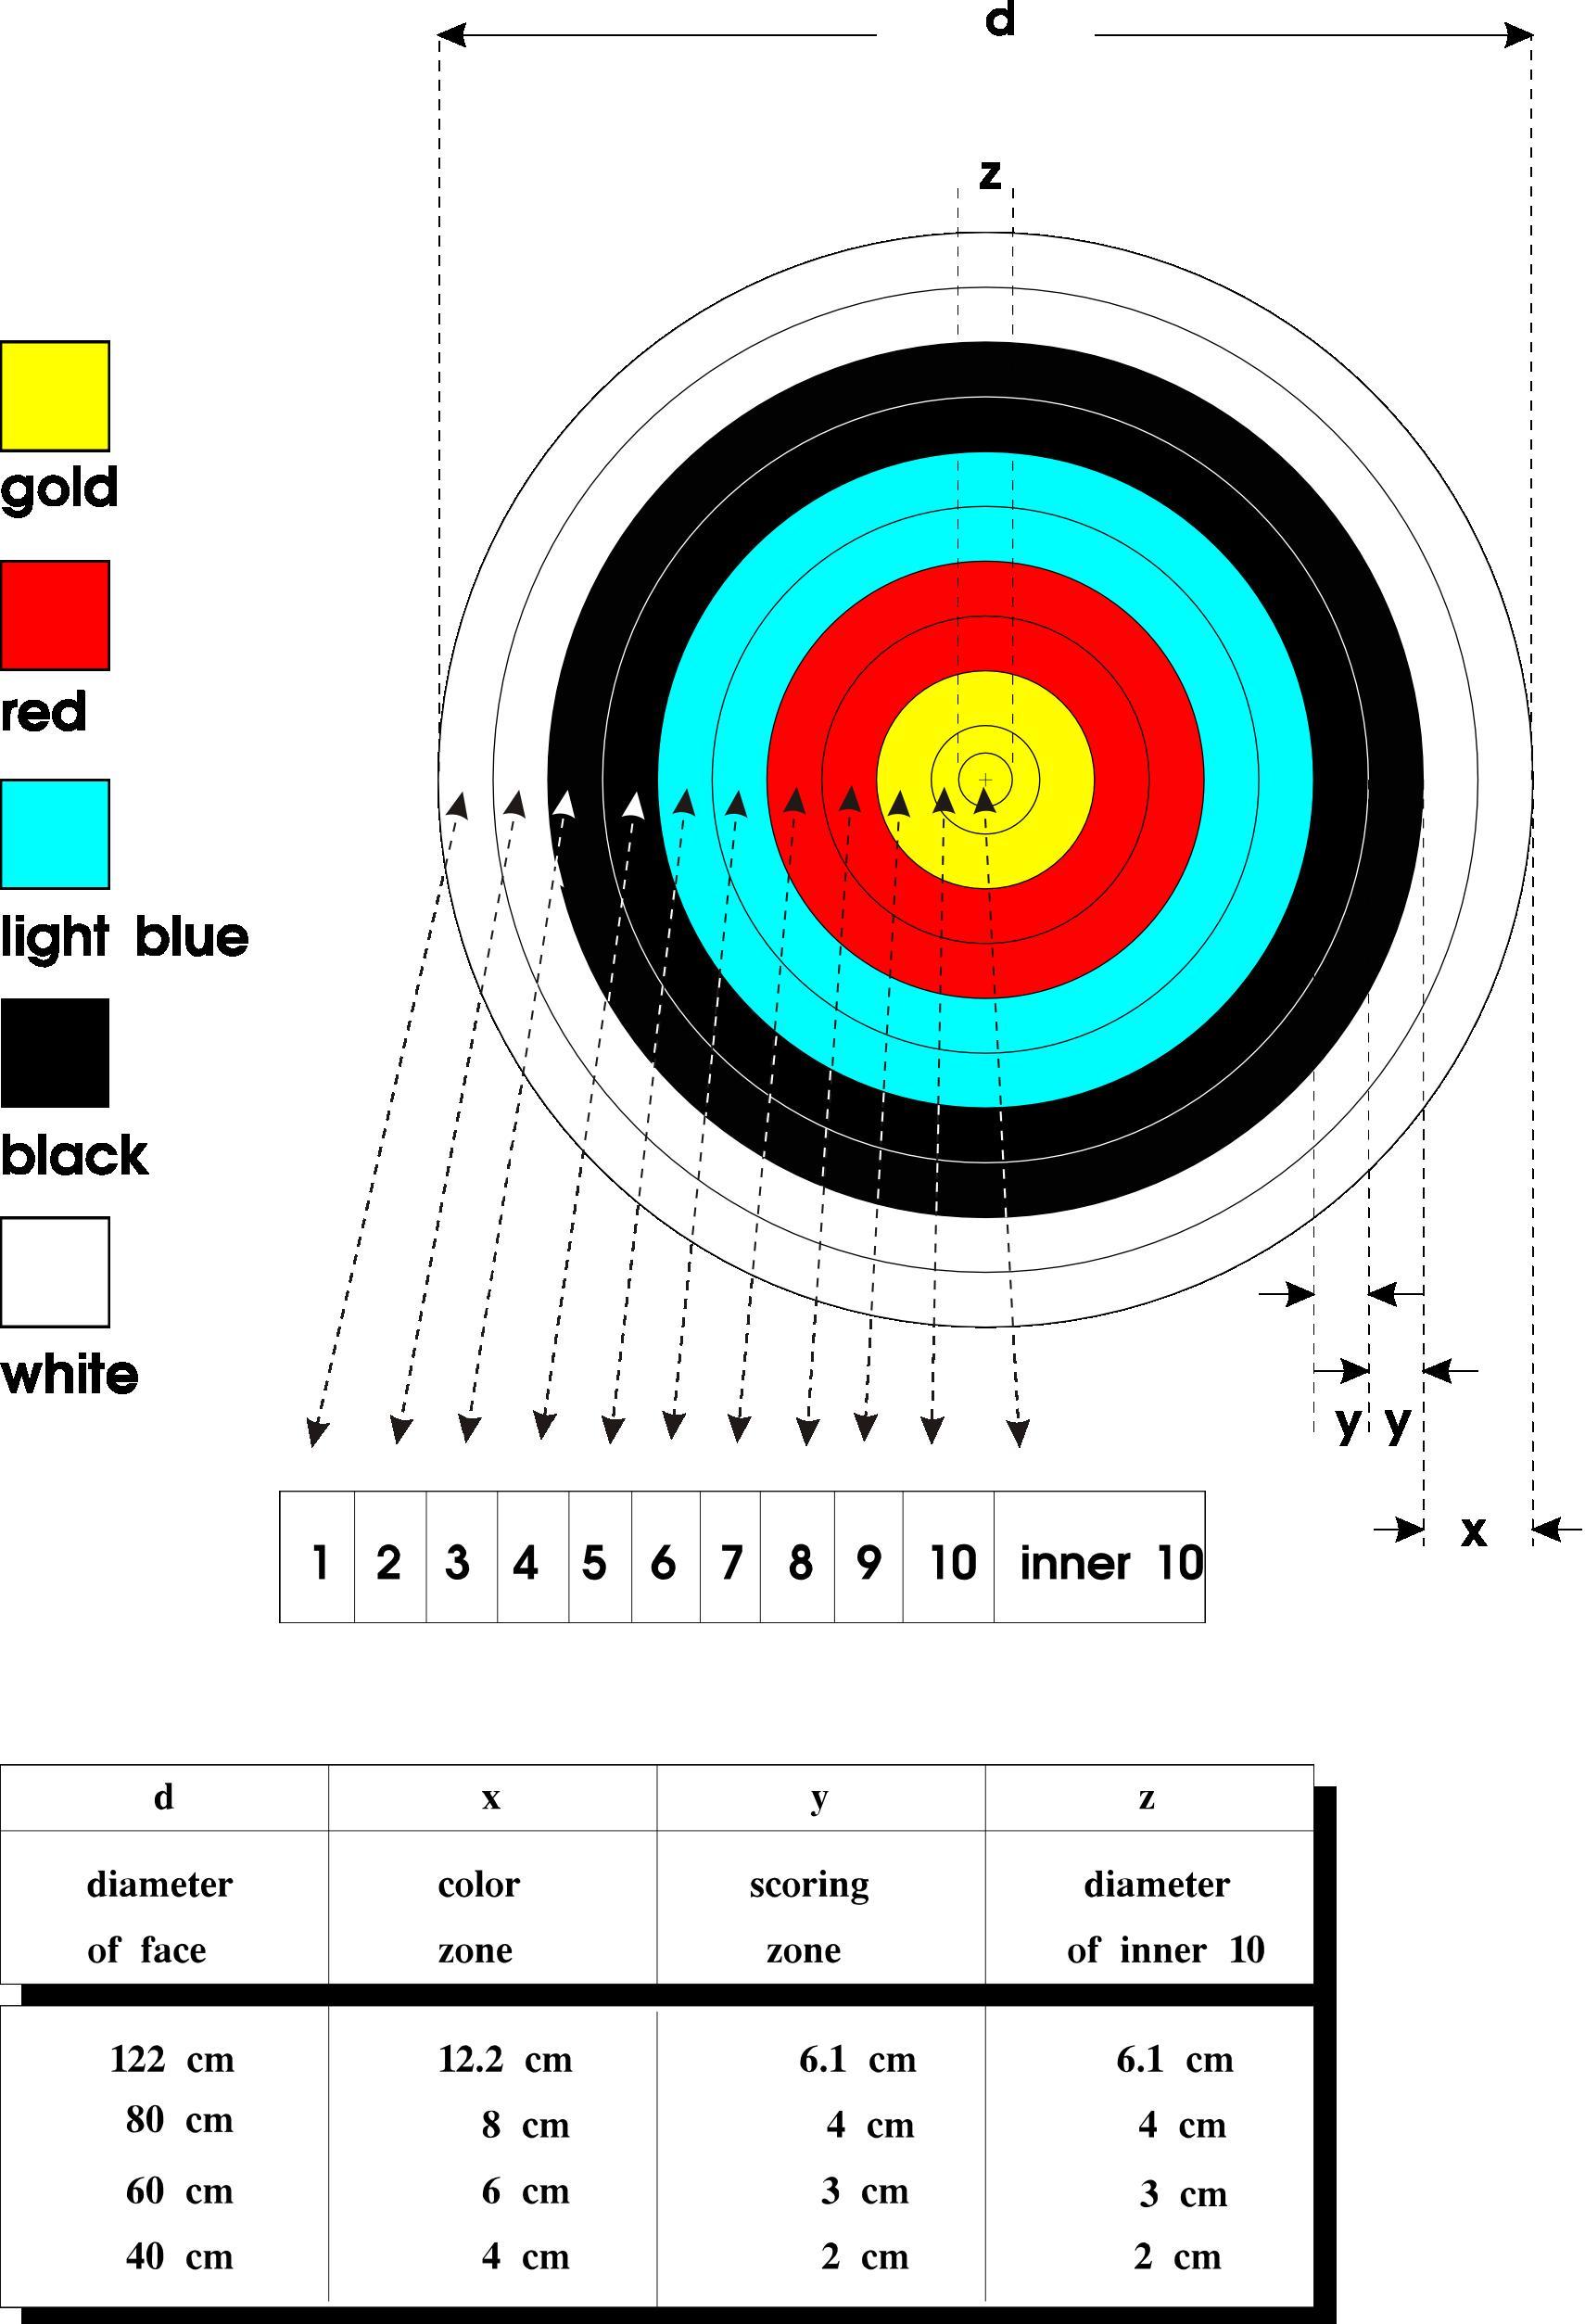 blason anglais 10 zones (target archery)